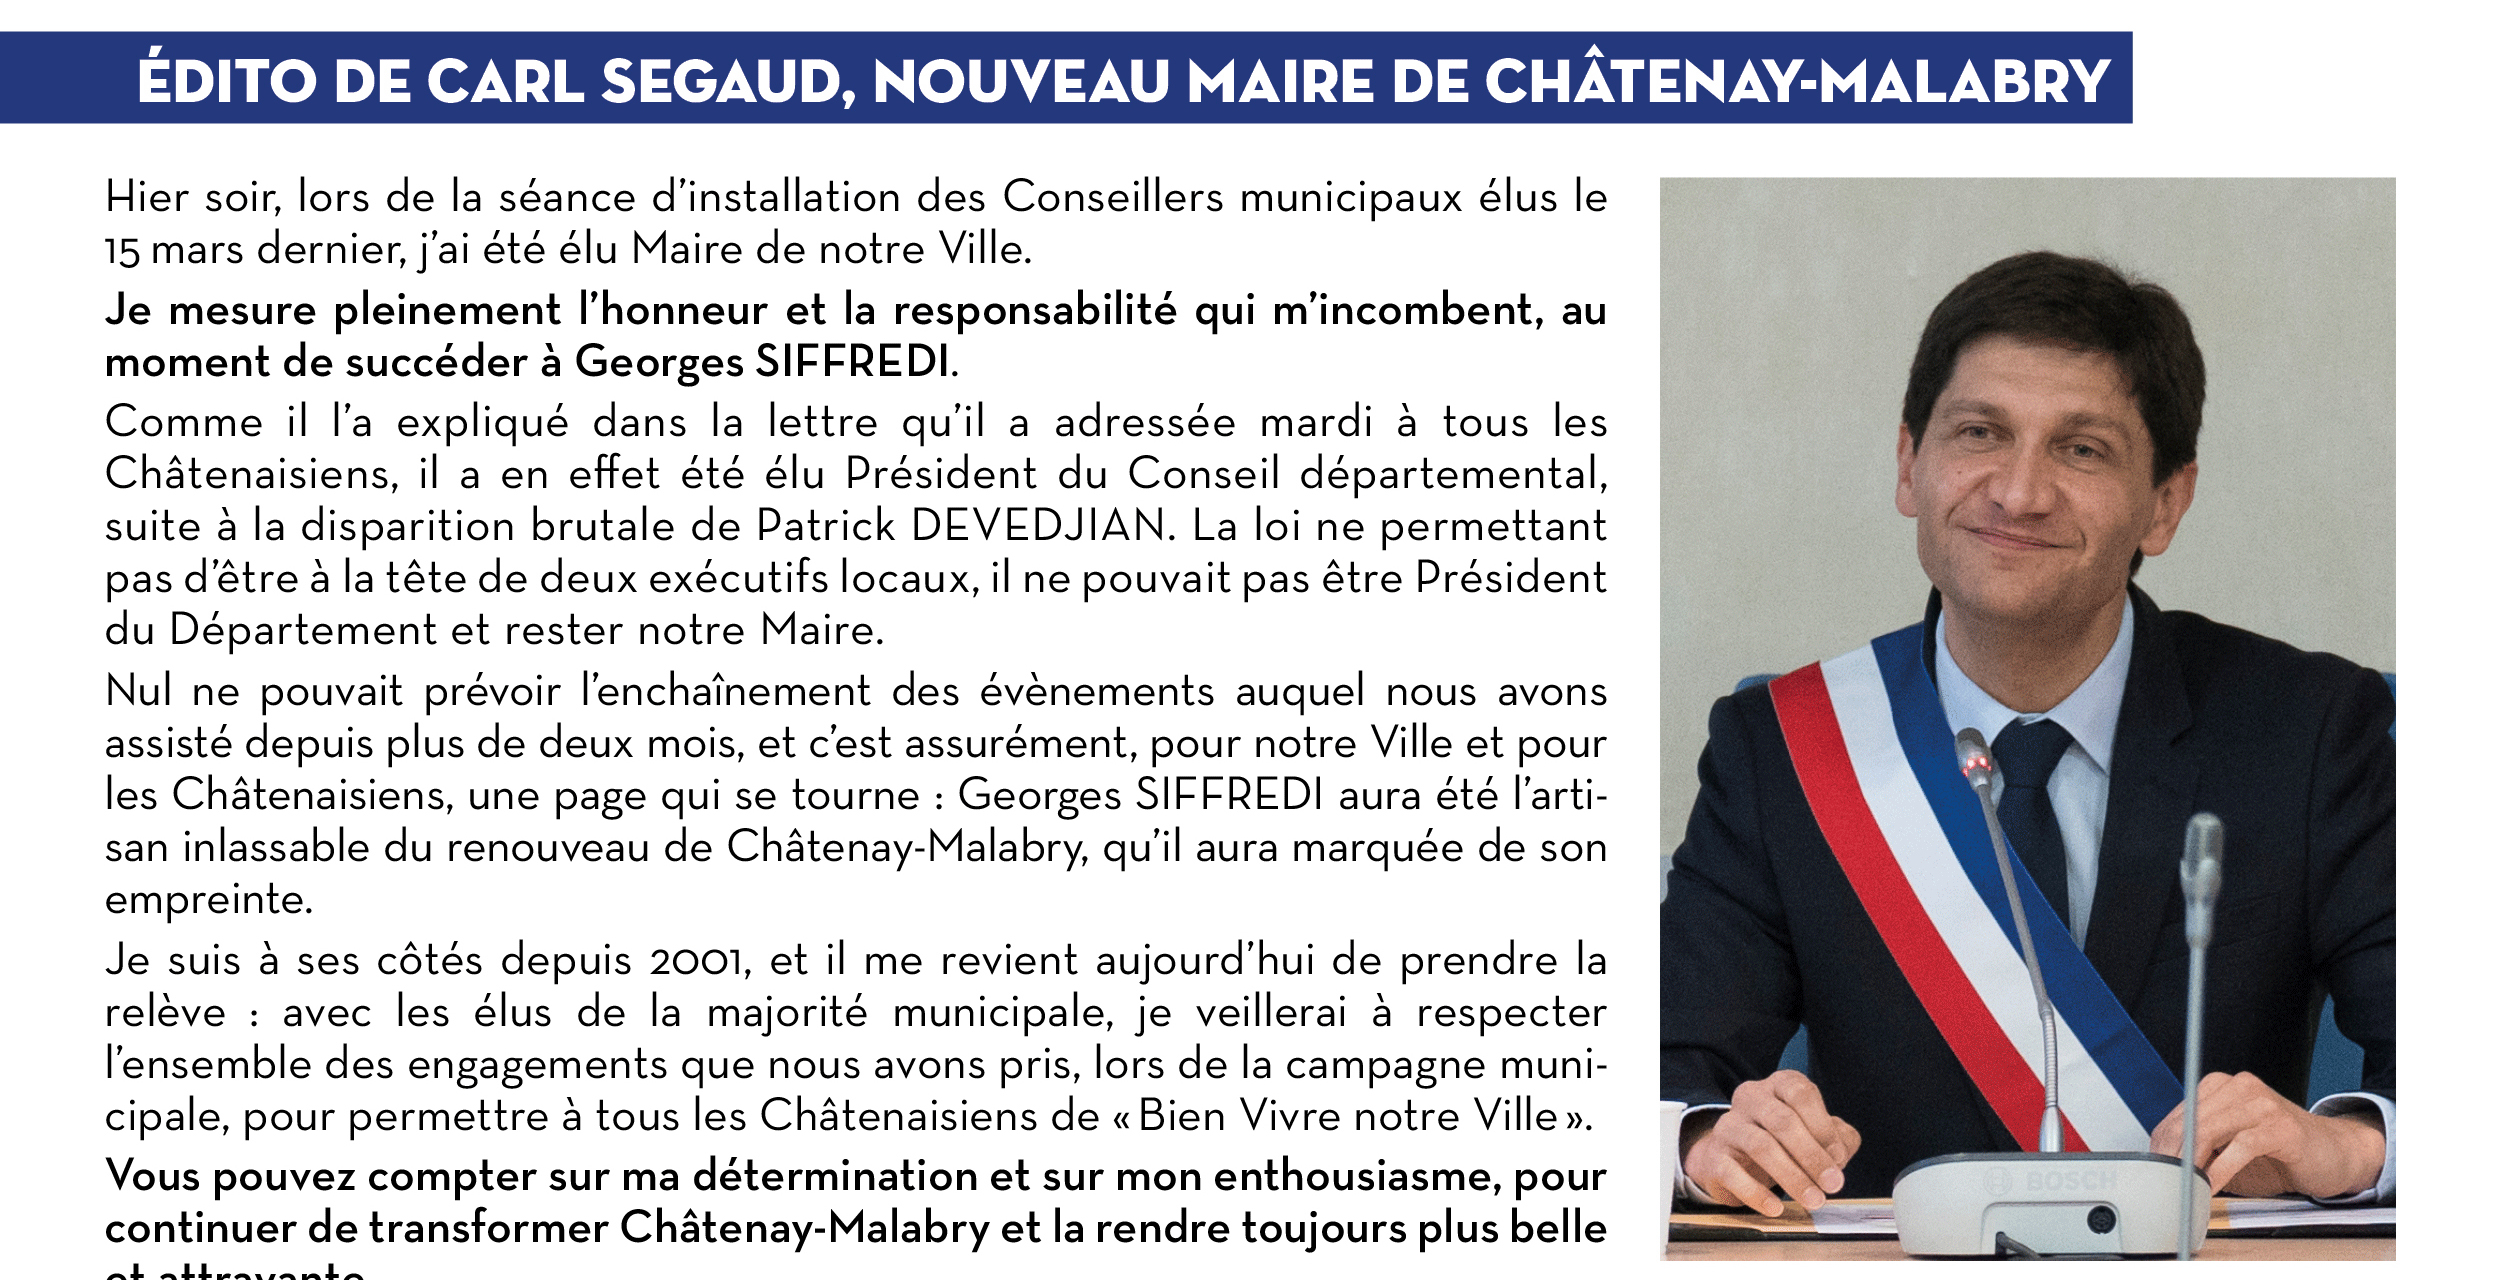 Édito de Carl Segaud, nouveau Maire de Châtenay-Malabry